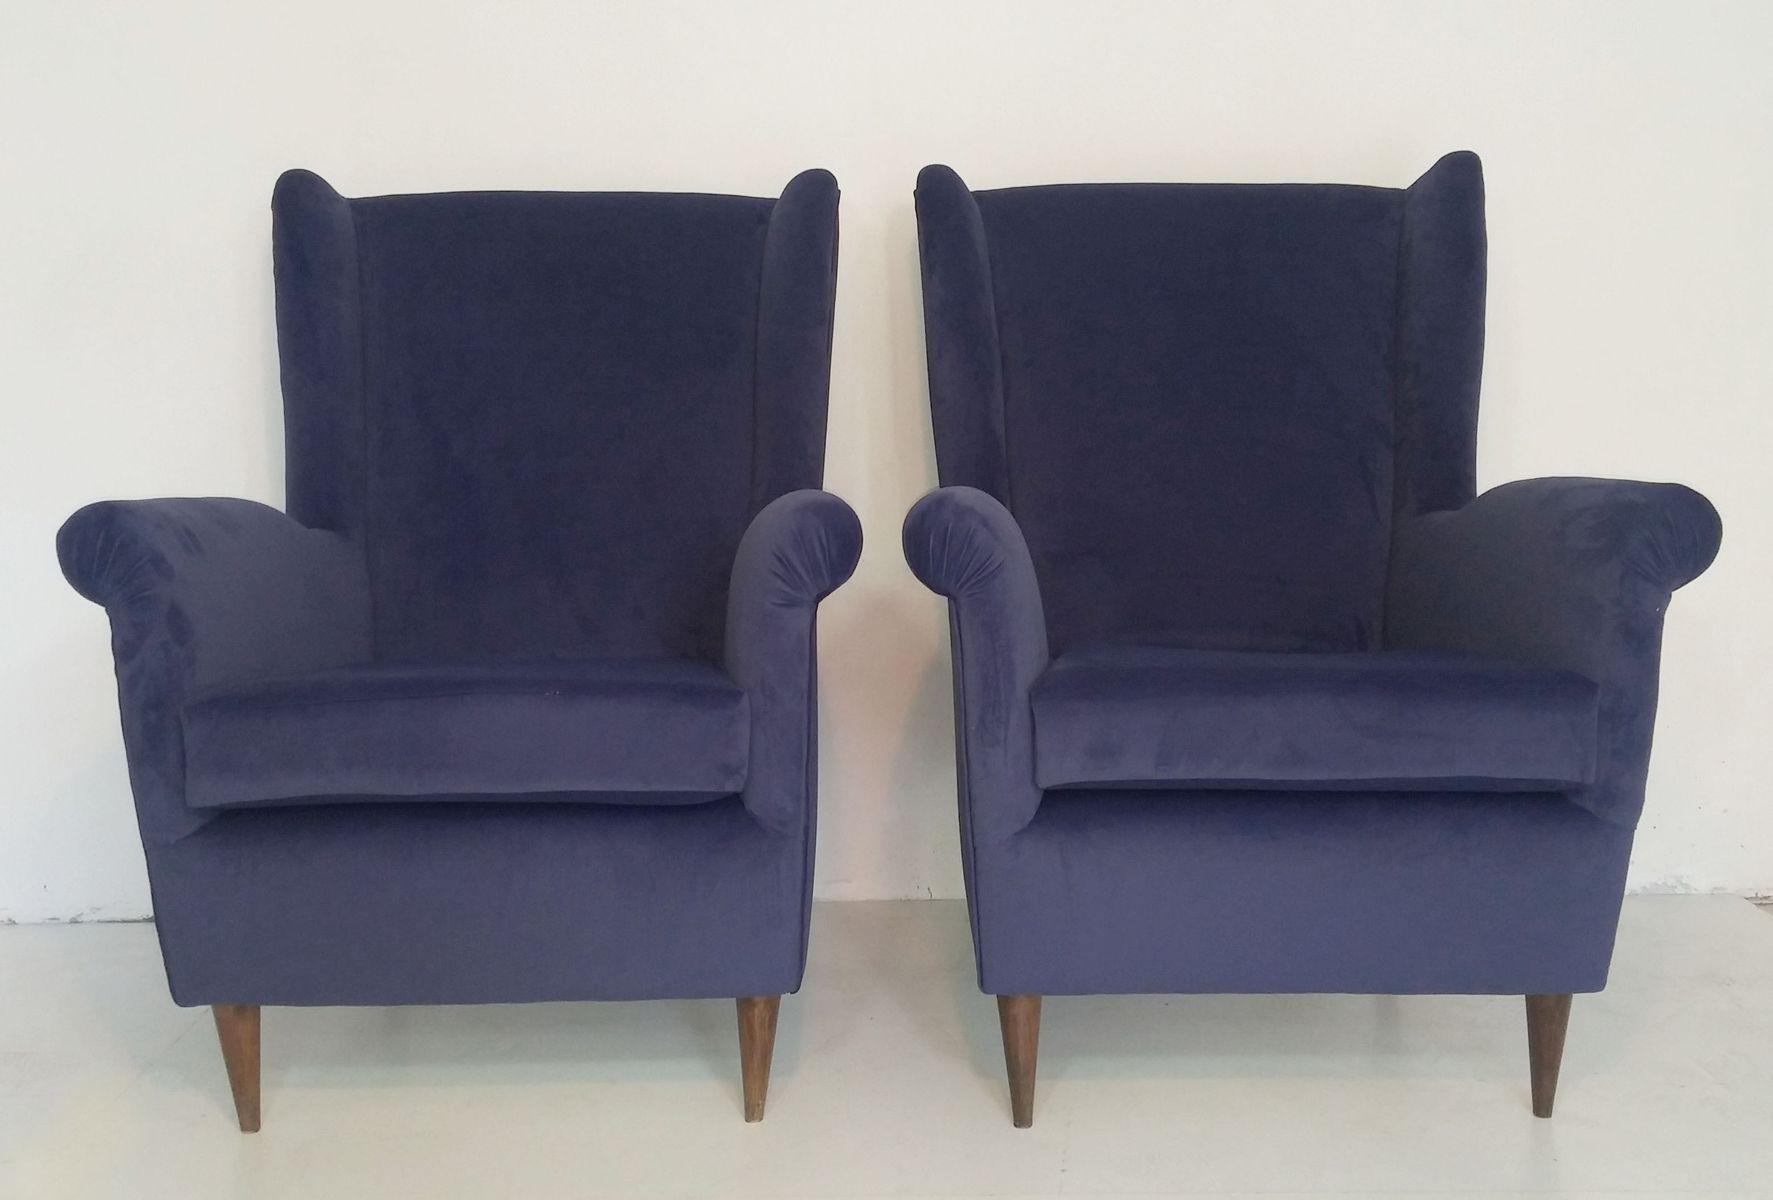 Mid-Century Sessel aus Samt, 2er Set